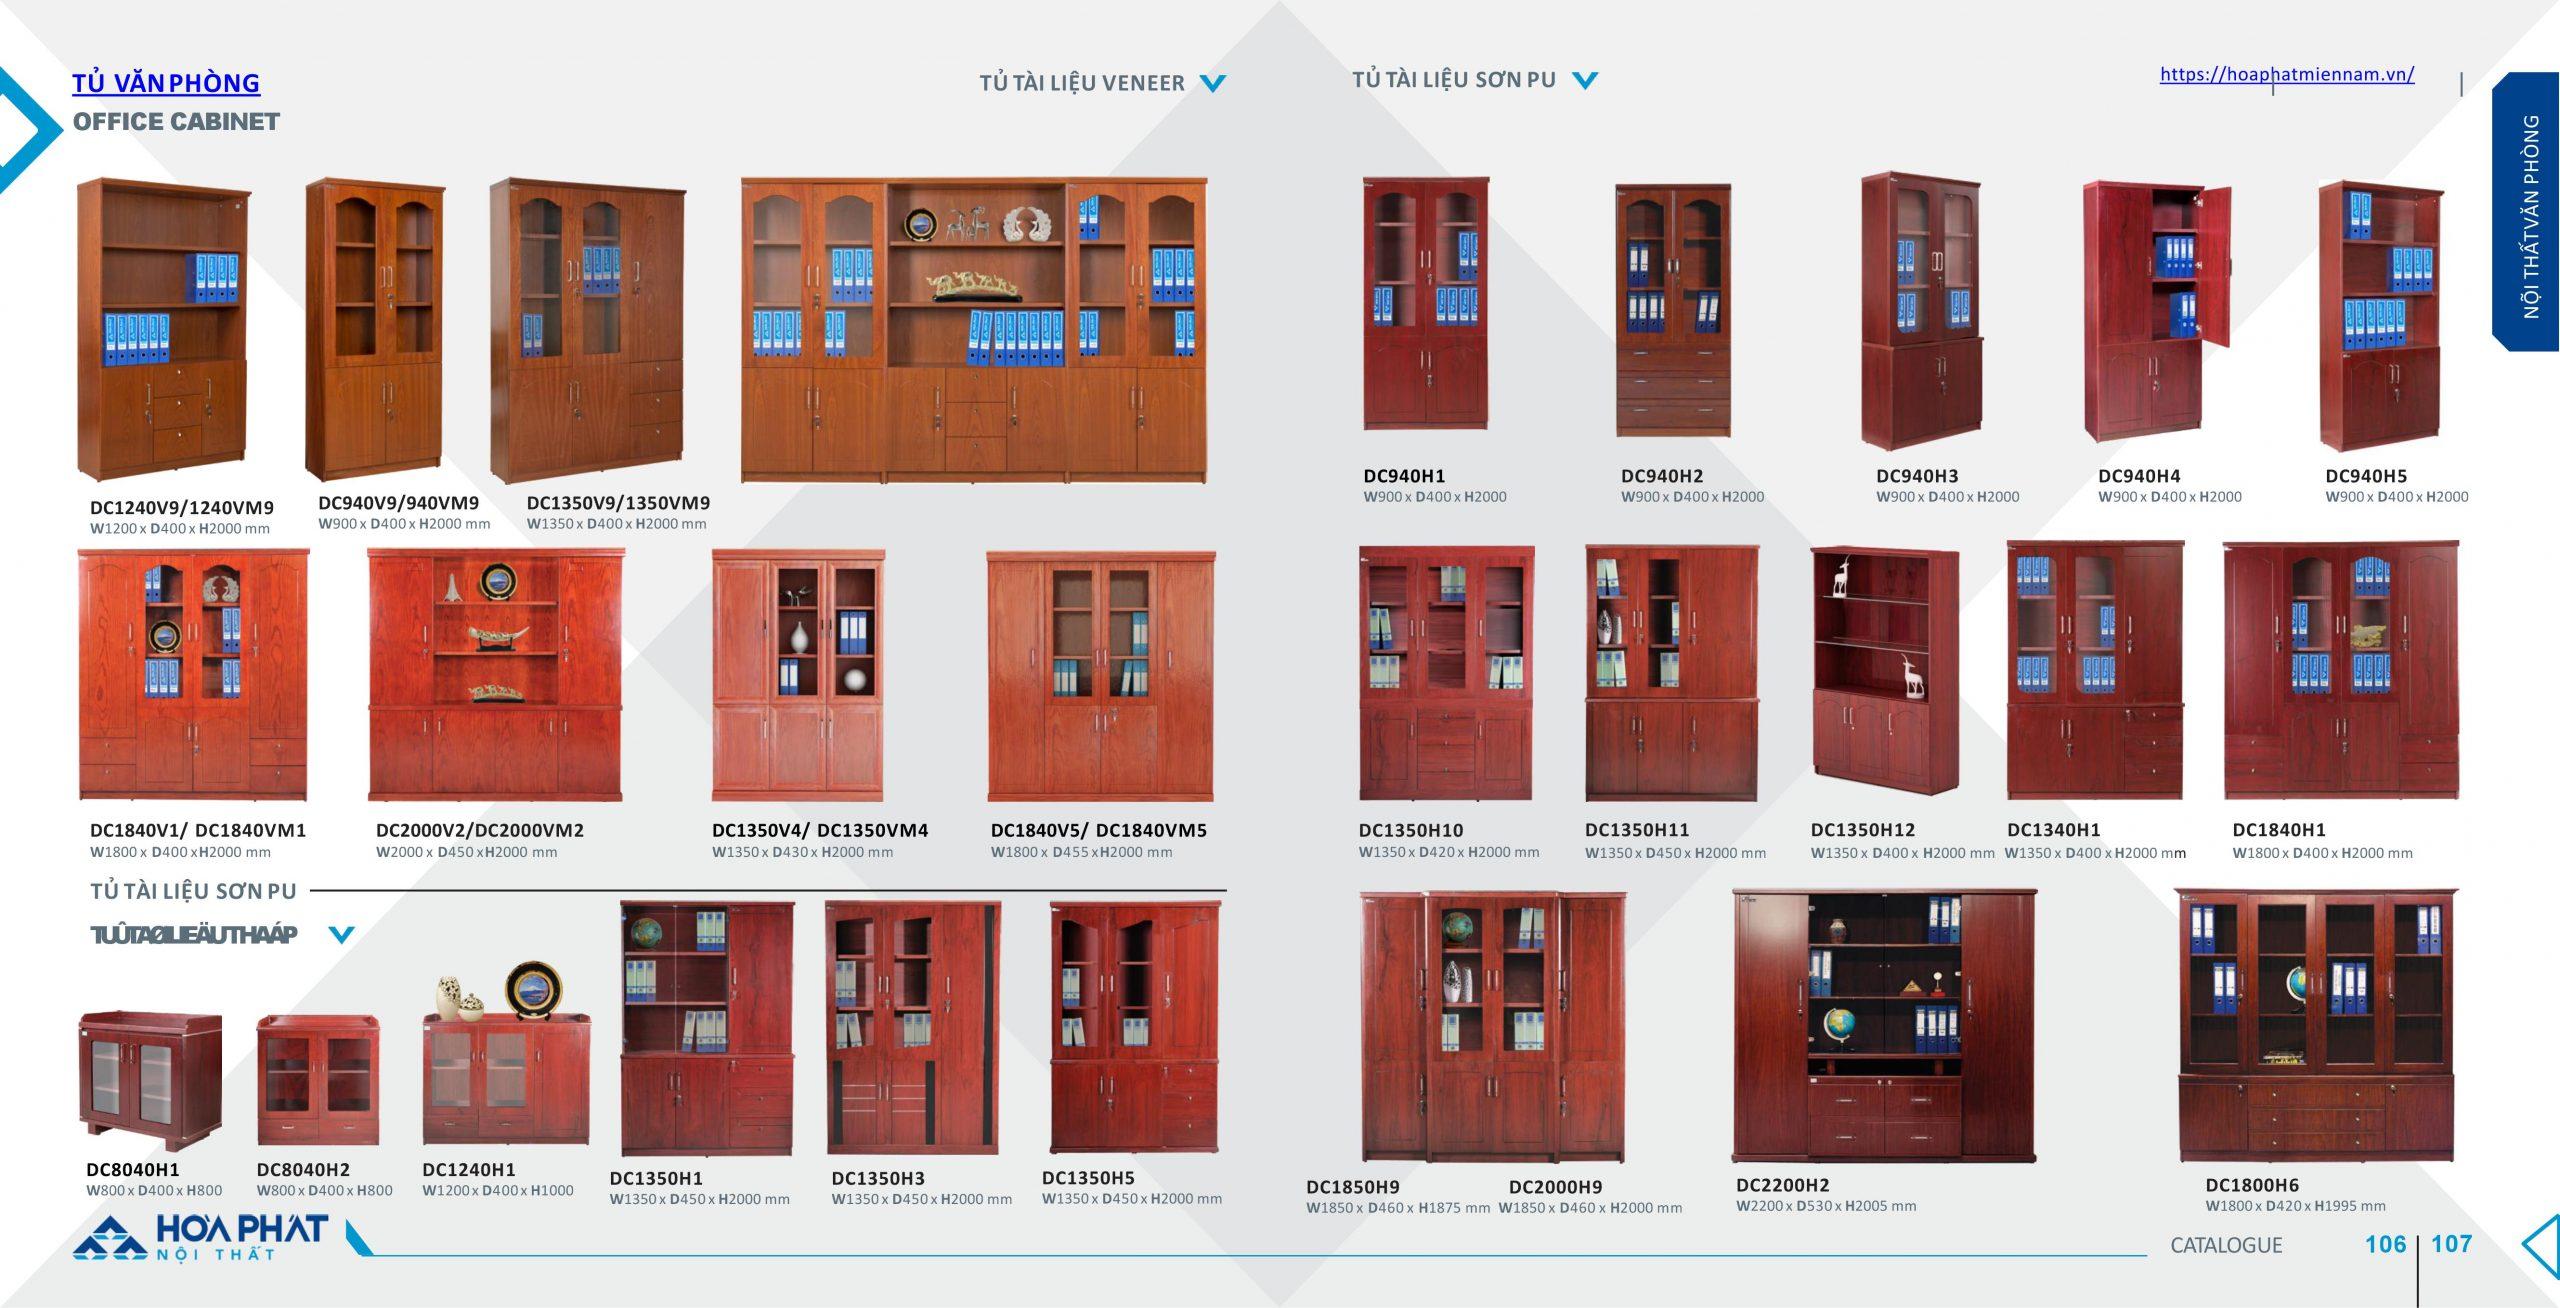 catalogue-tu-hoa-phat-1